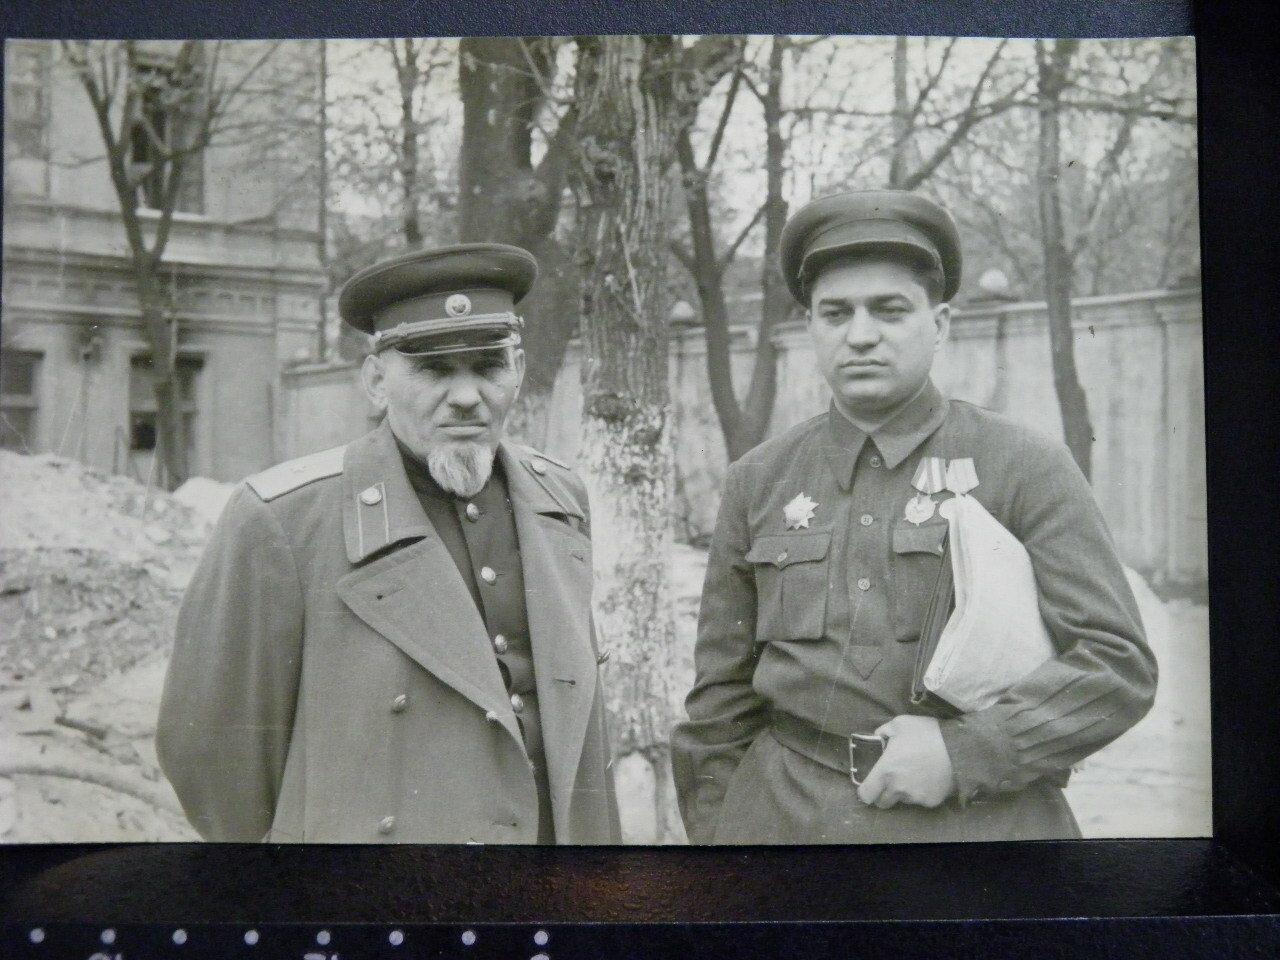 Сидор Артемьевич Ковпак и комиссар Кизя Л.Е. в Киеве. 1947